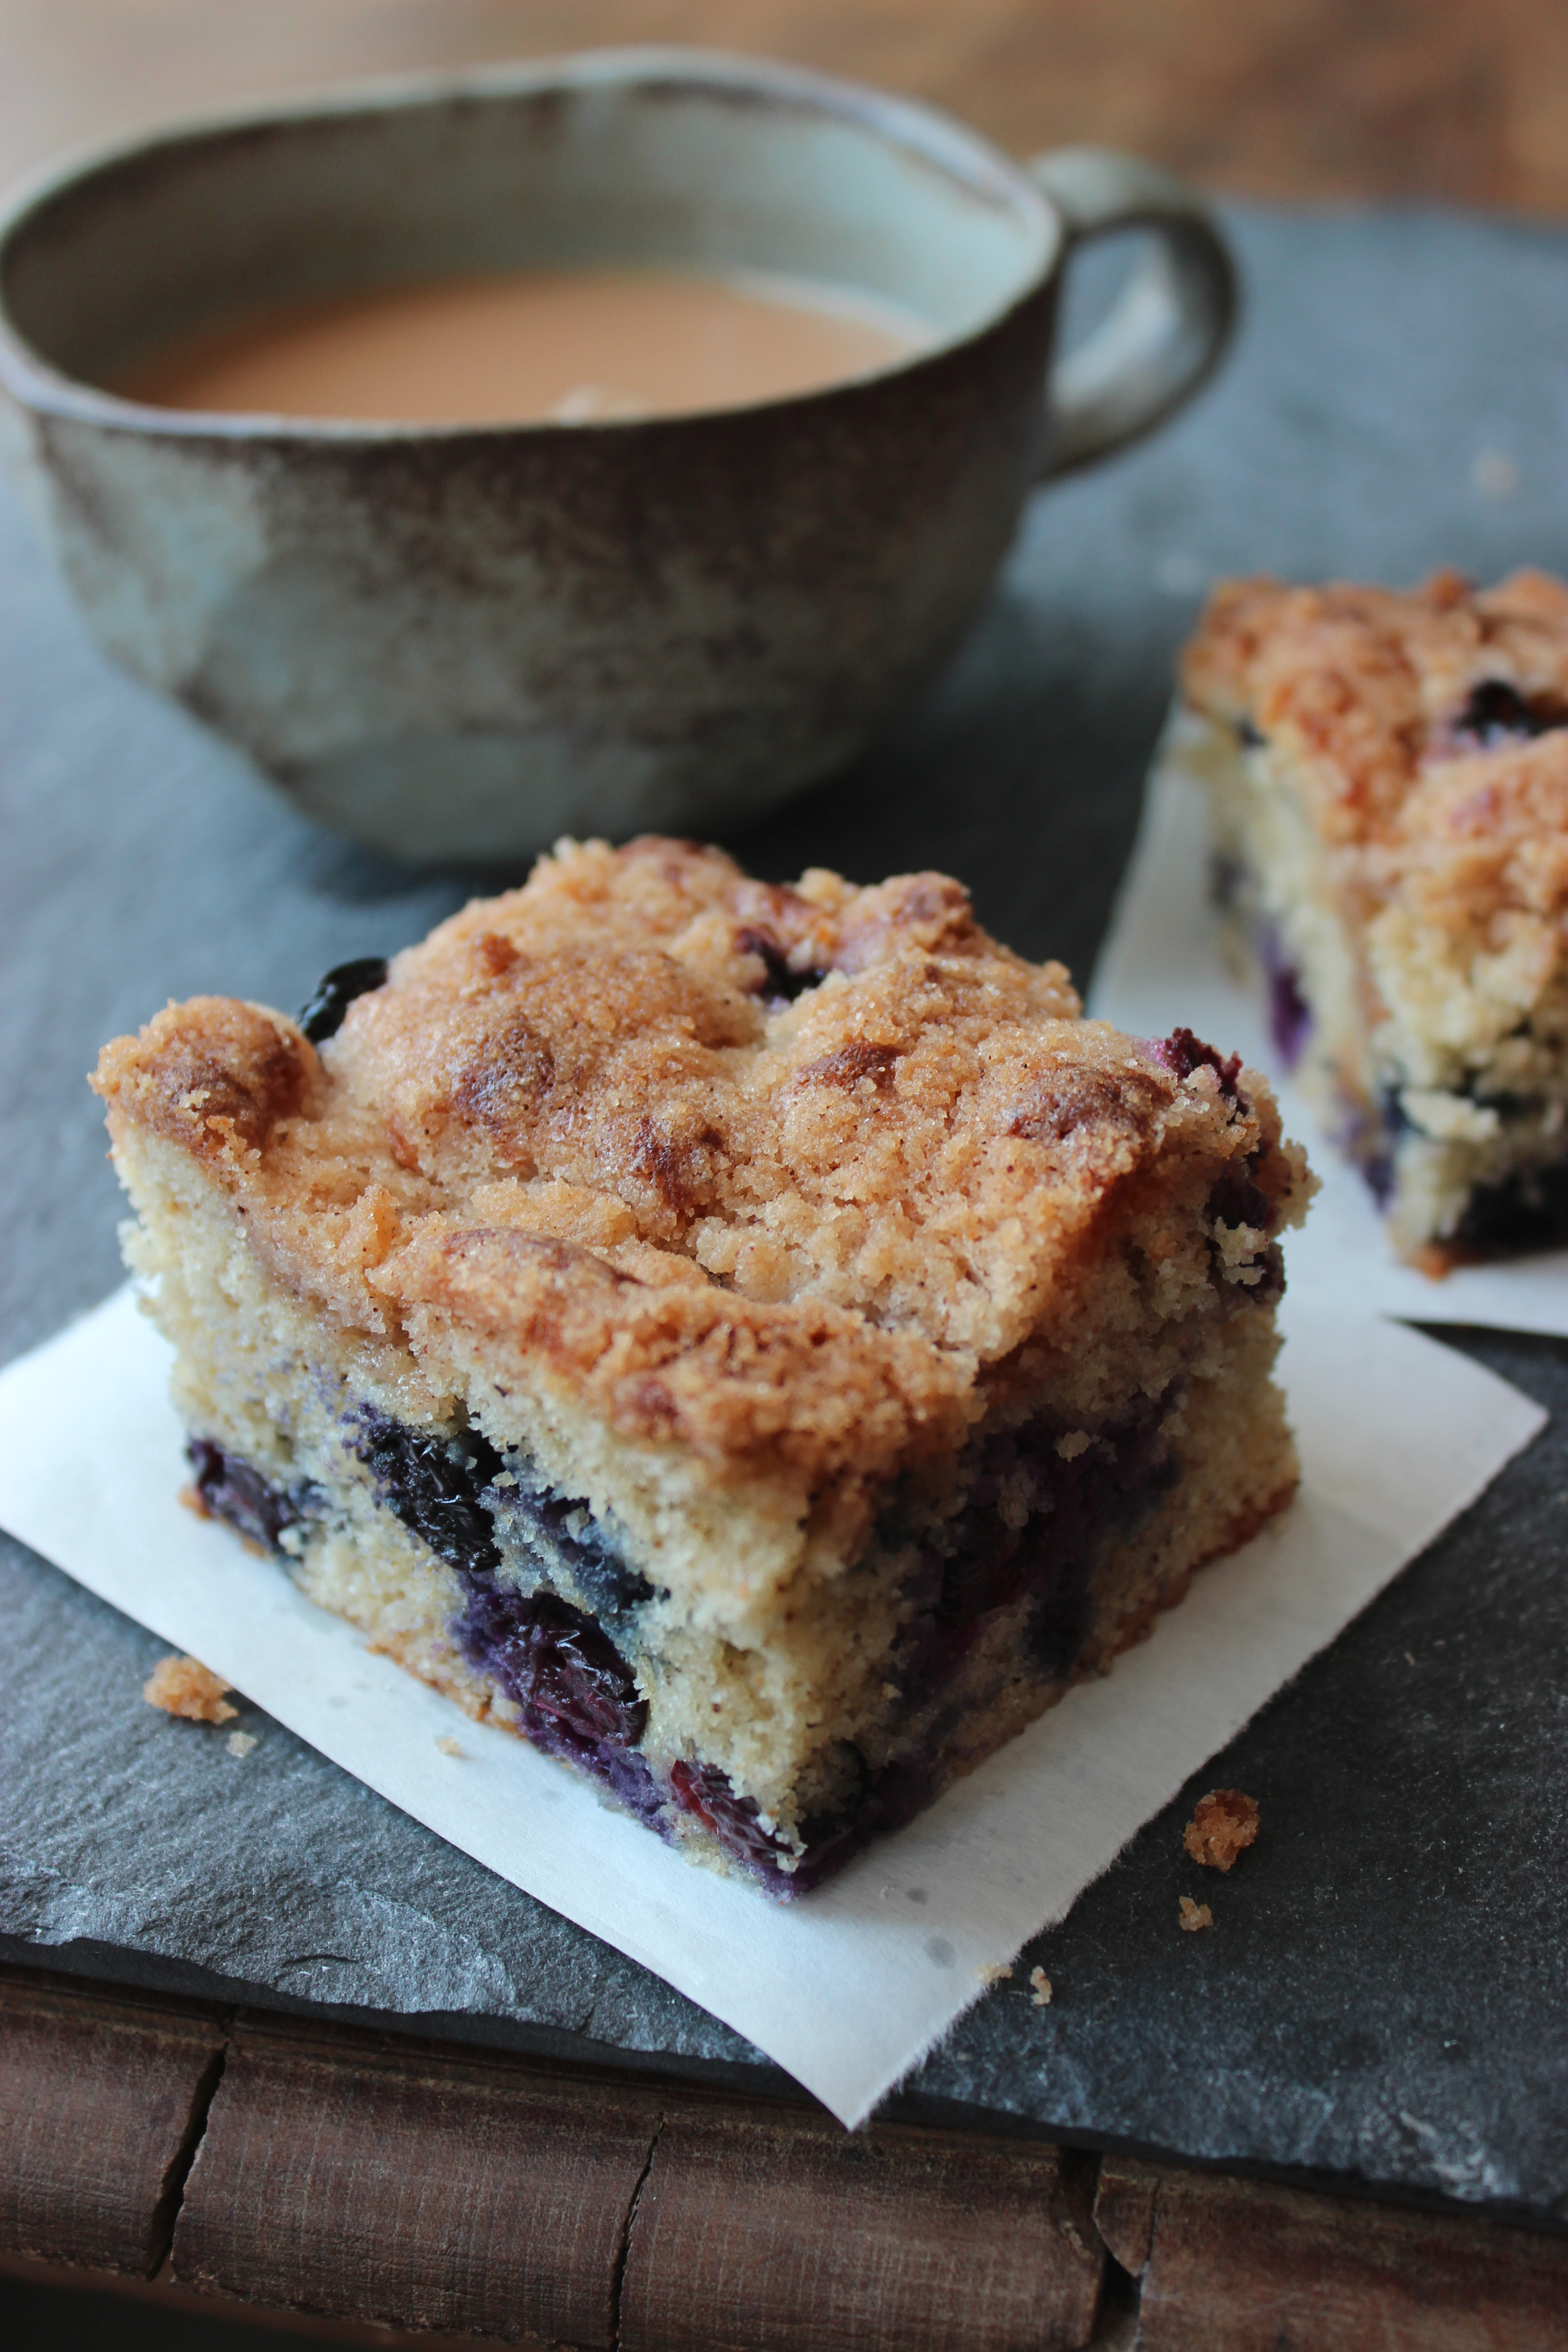 Blueberry Coffee Cake  Blueberry Coffee Cake U S Highbush Blueberry Council